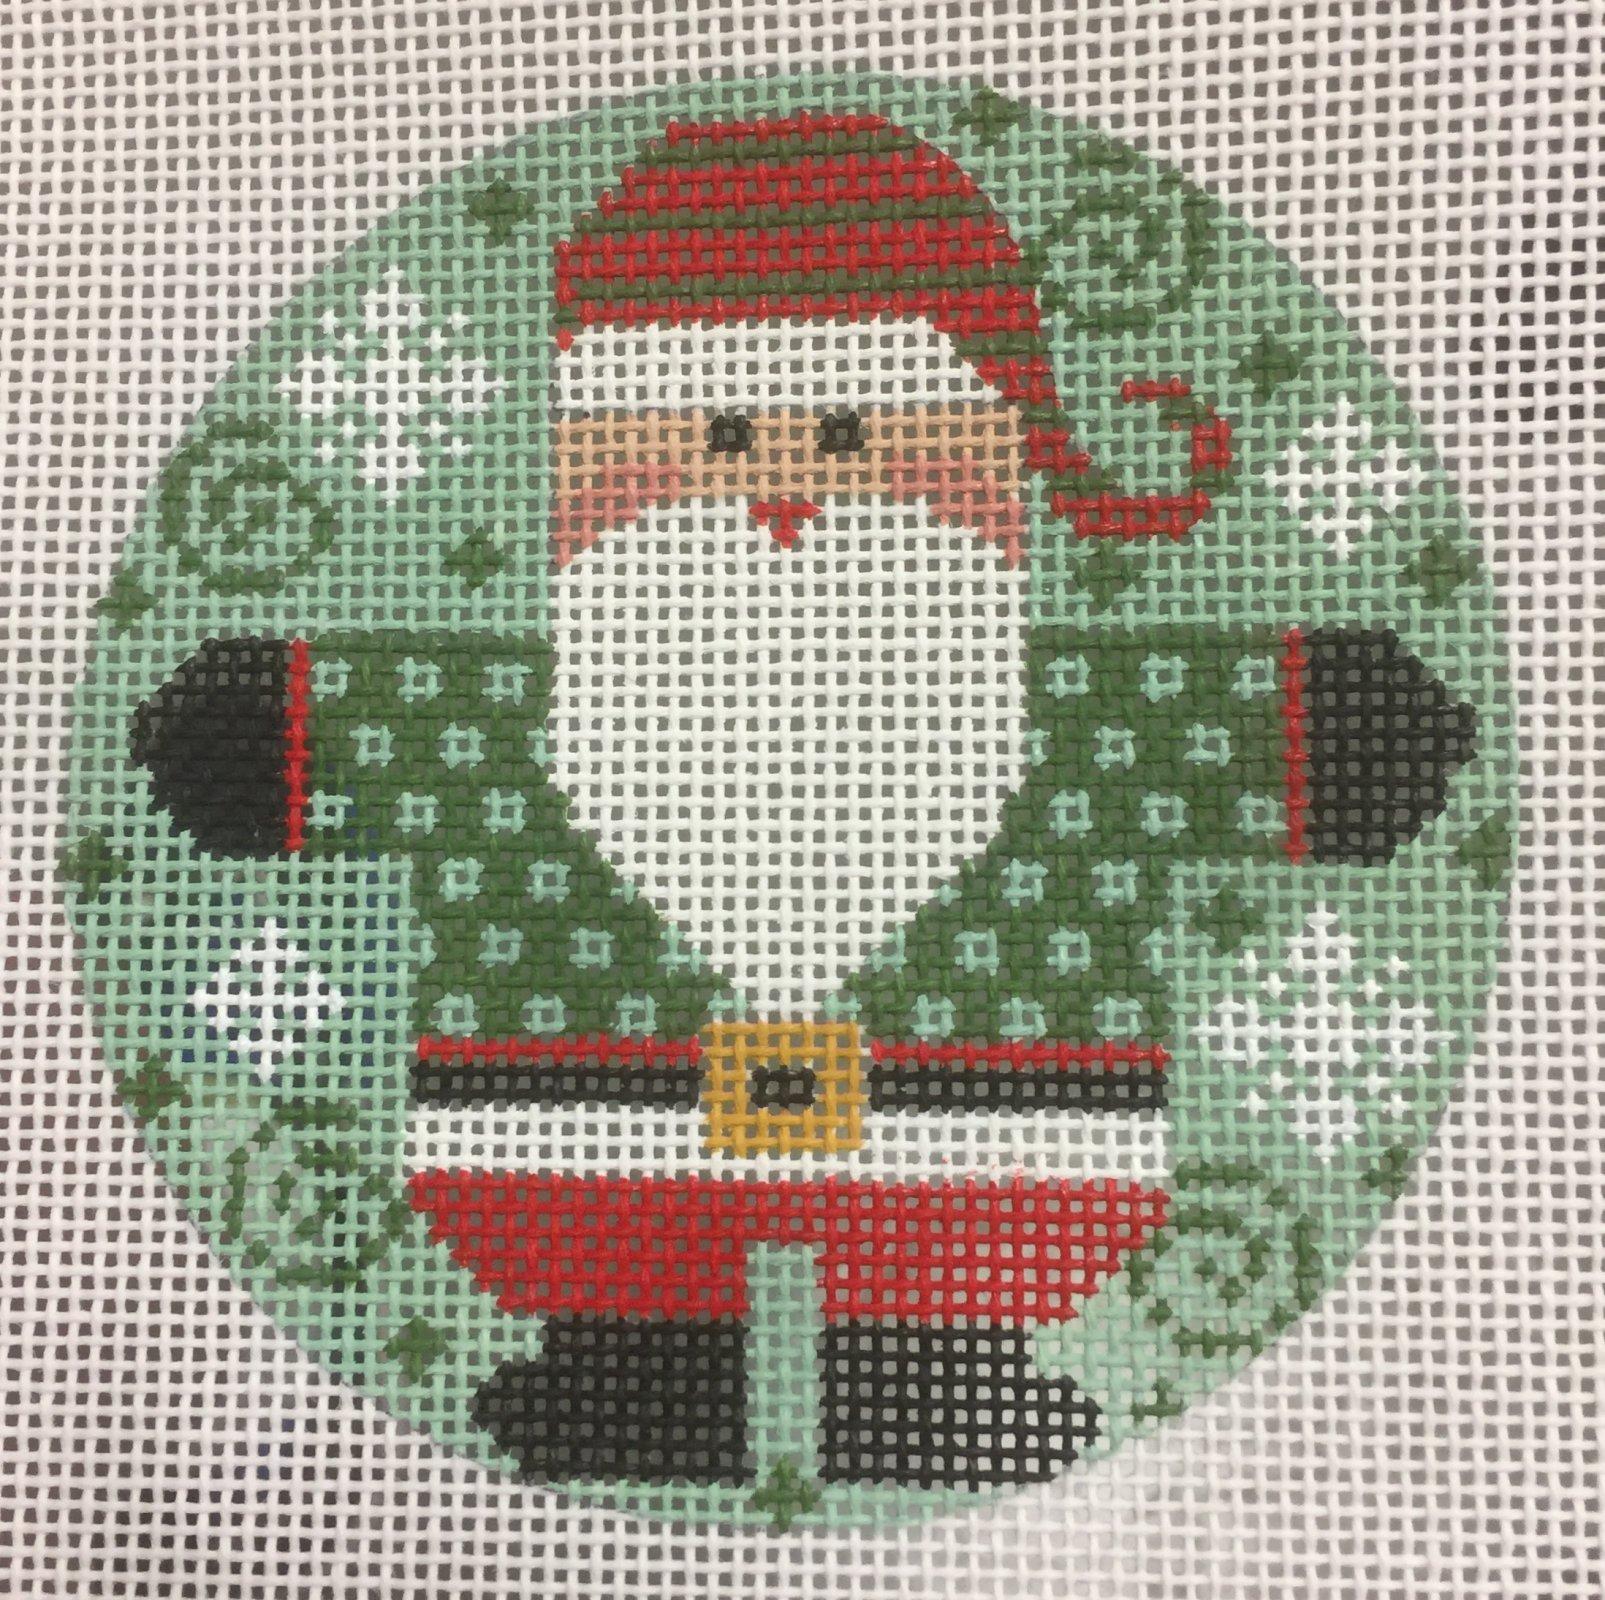 Santa Round - Checkered Coat in Greens